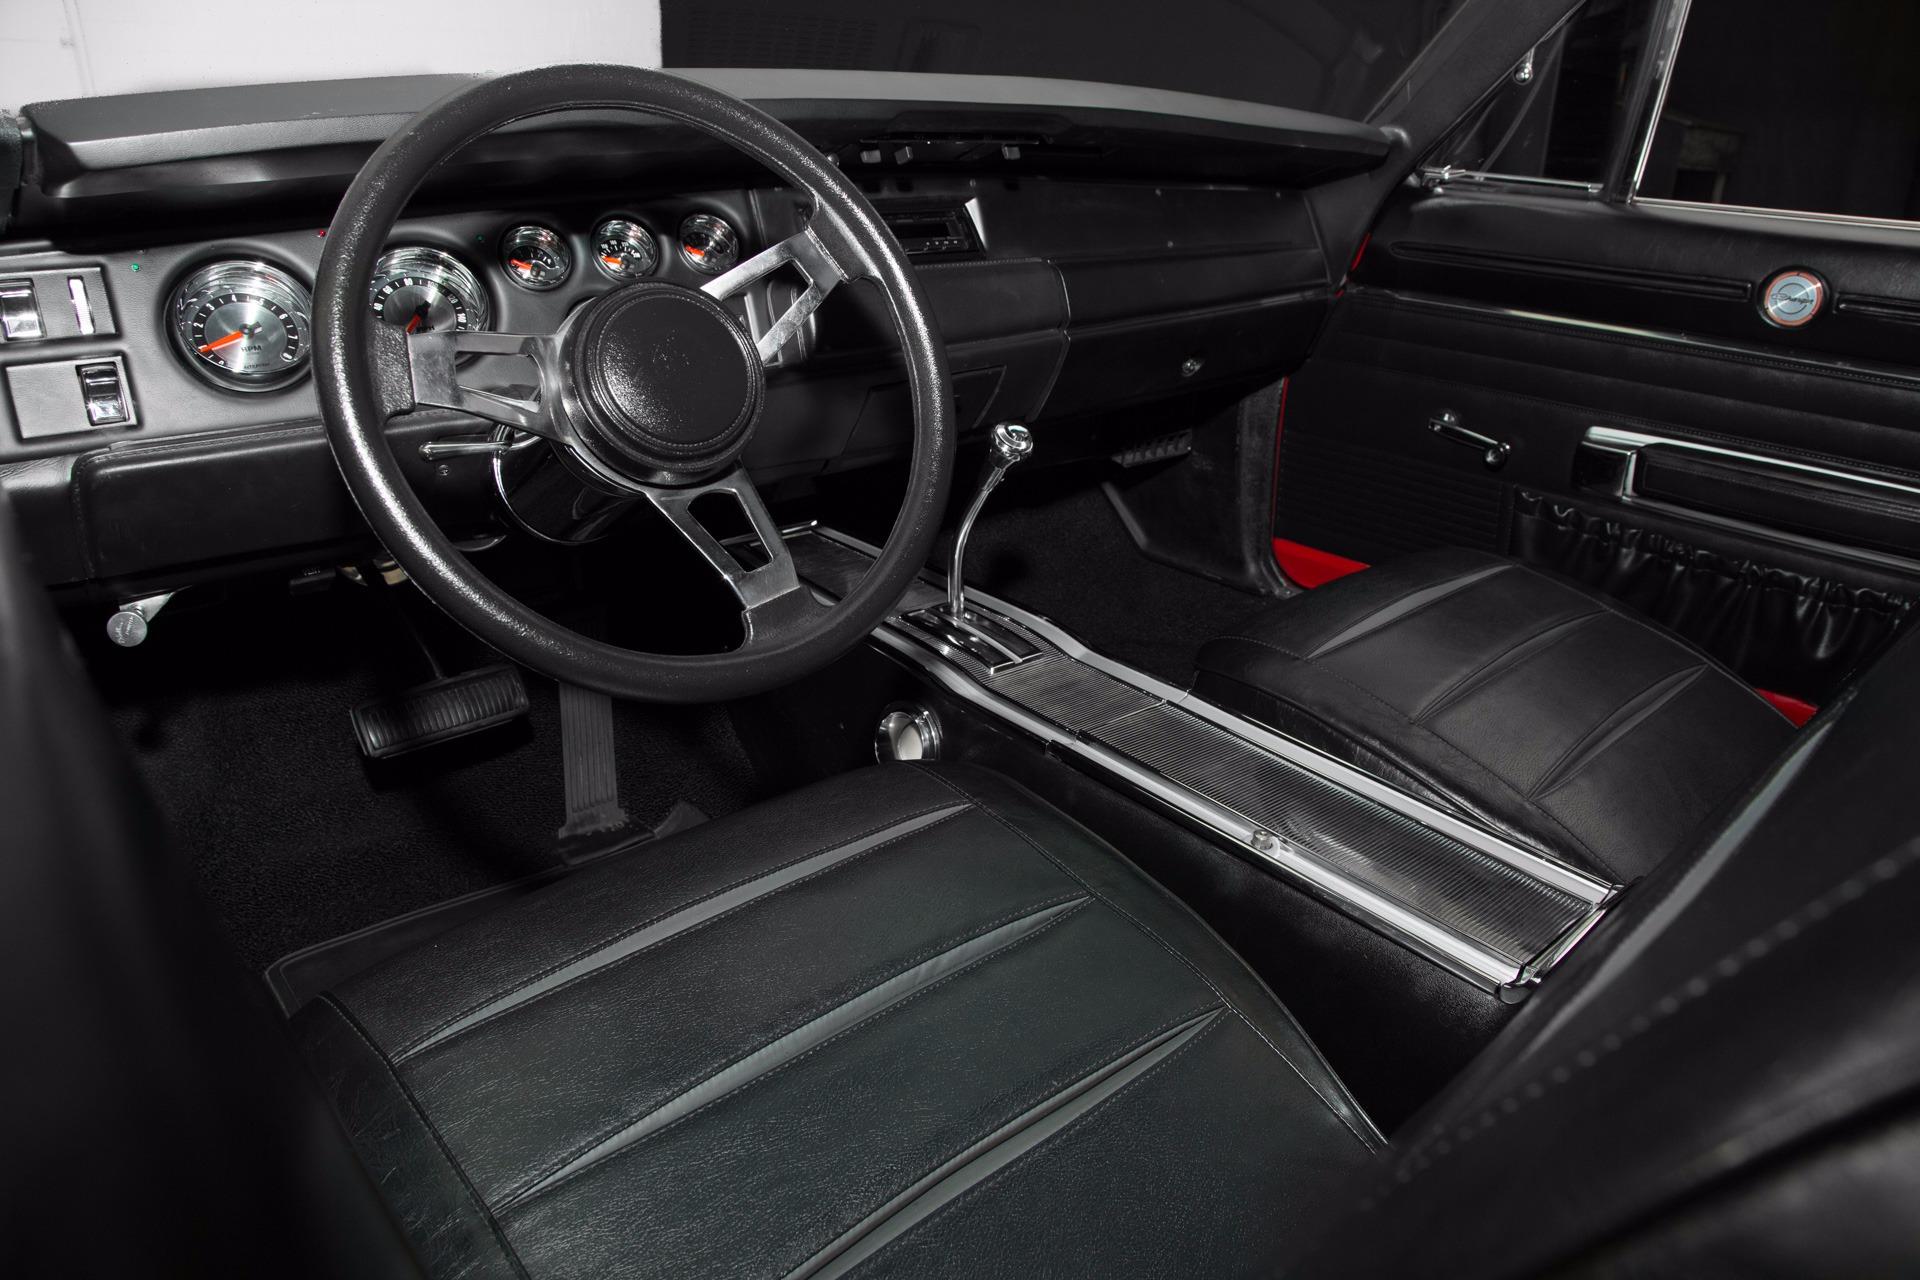 1968 Dodge Charger Hemi 615hp Rotisserie Resto Stock 3977 357 White Used St Petersburg Fl